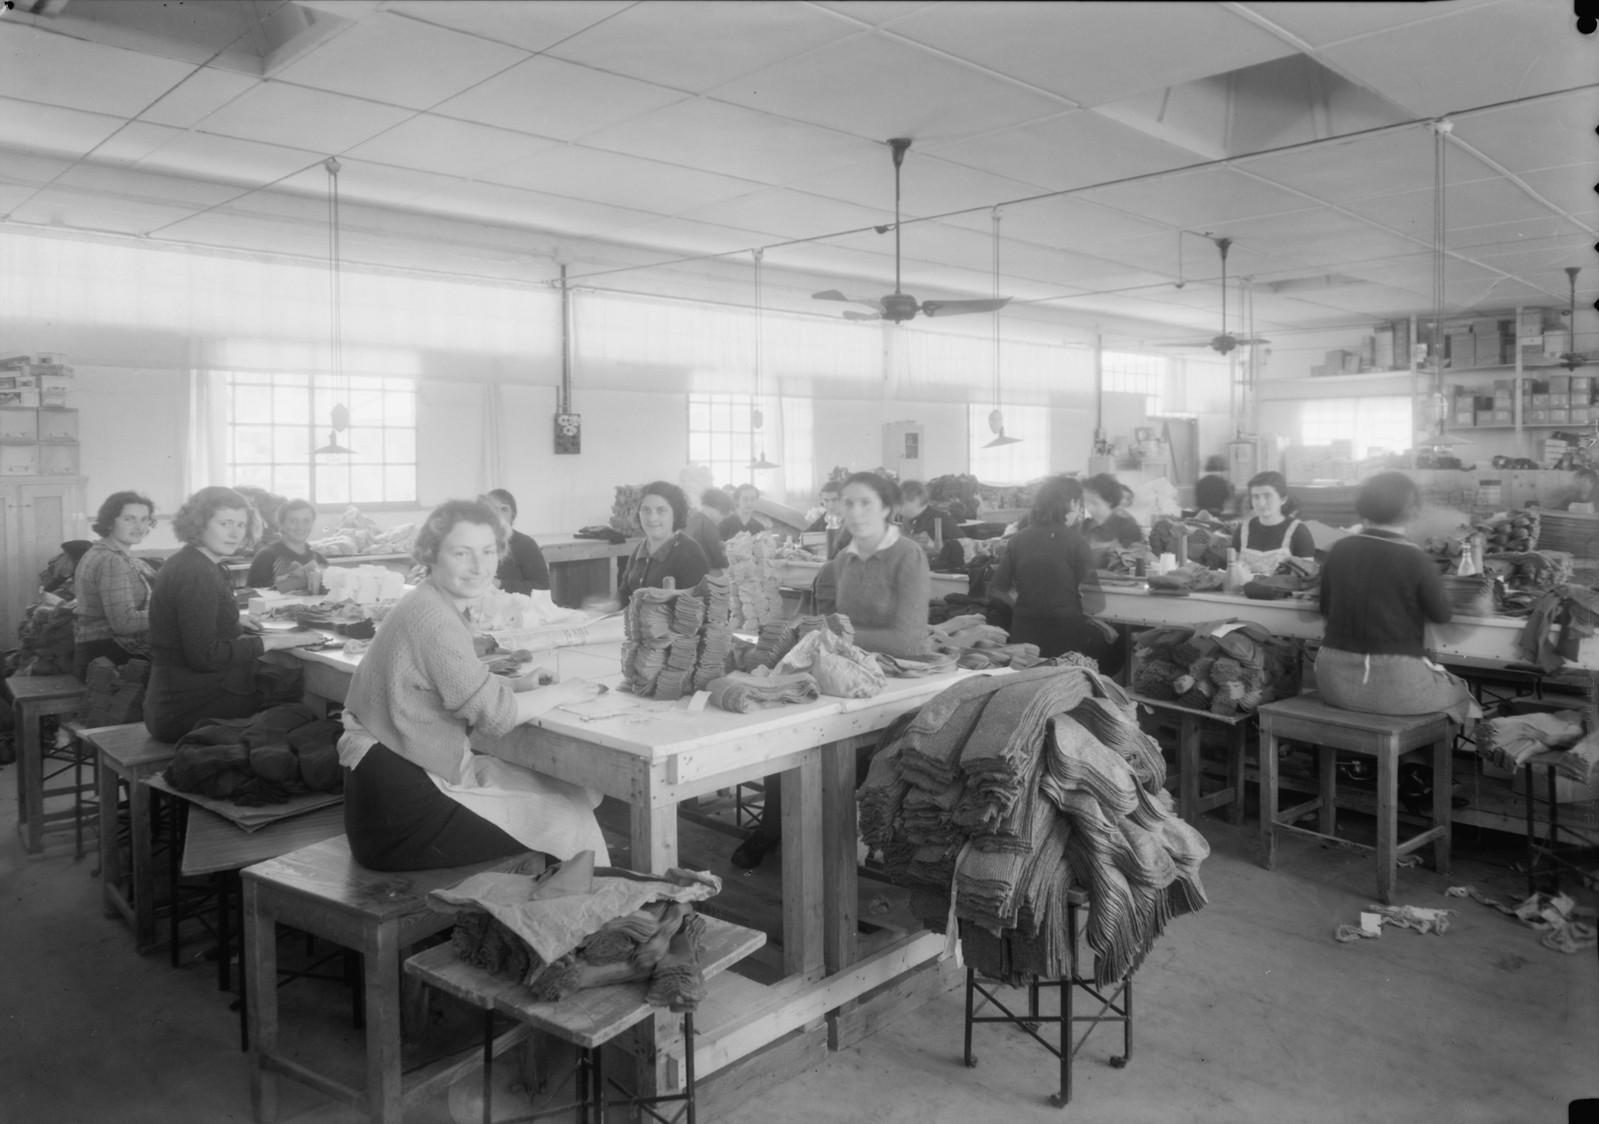 08. Lodzia Textile Co. в поселке Холон. Доработка носков и чулок